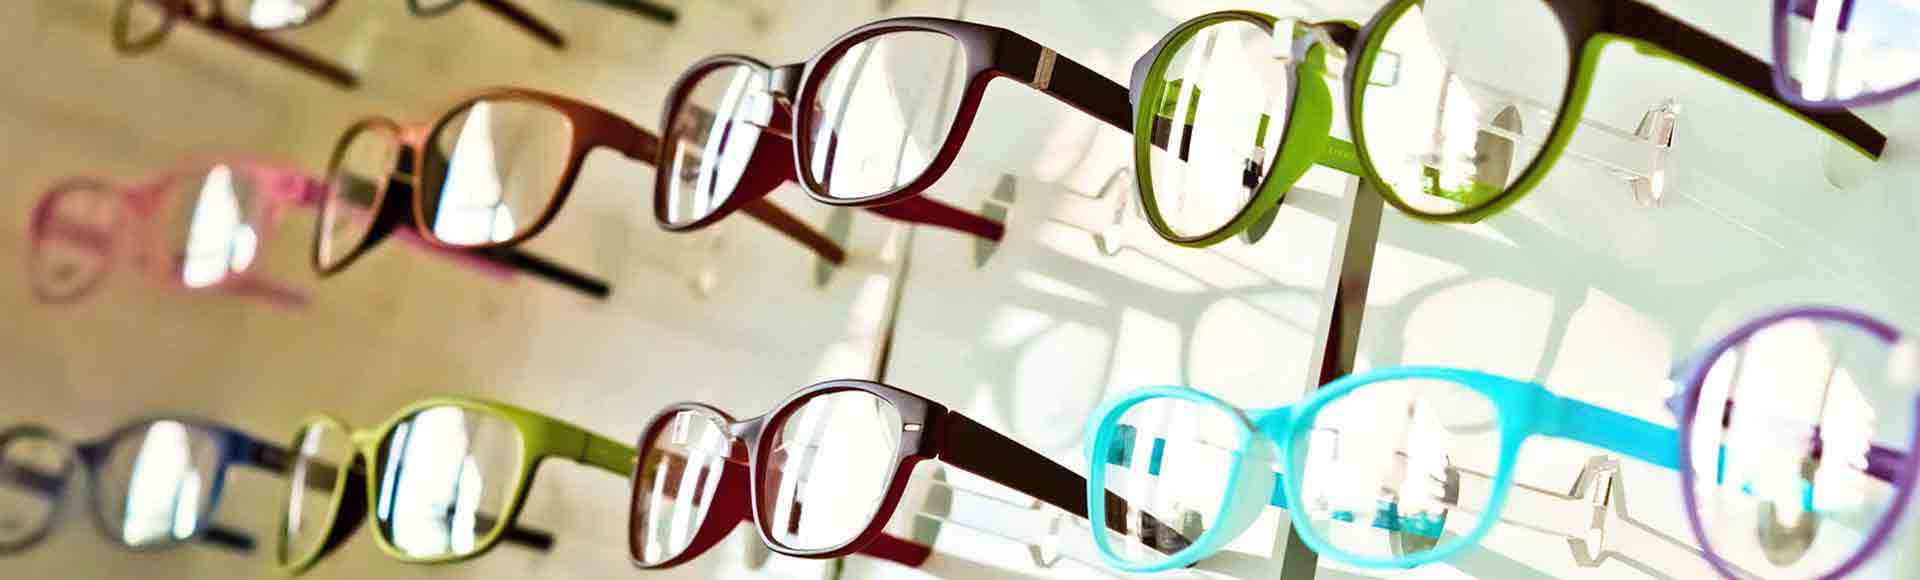 Aralco POS for Optical